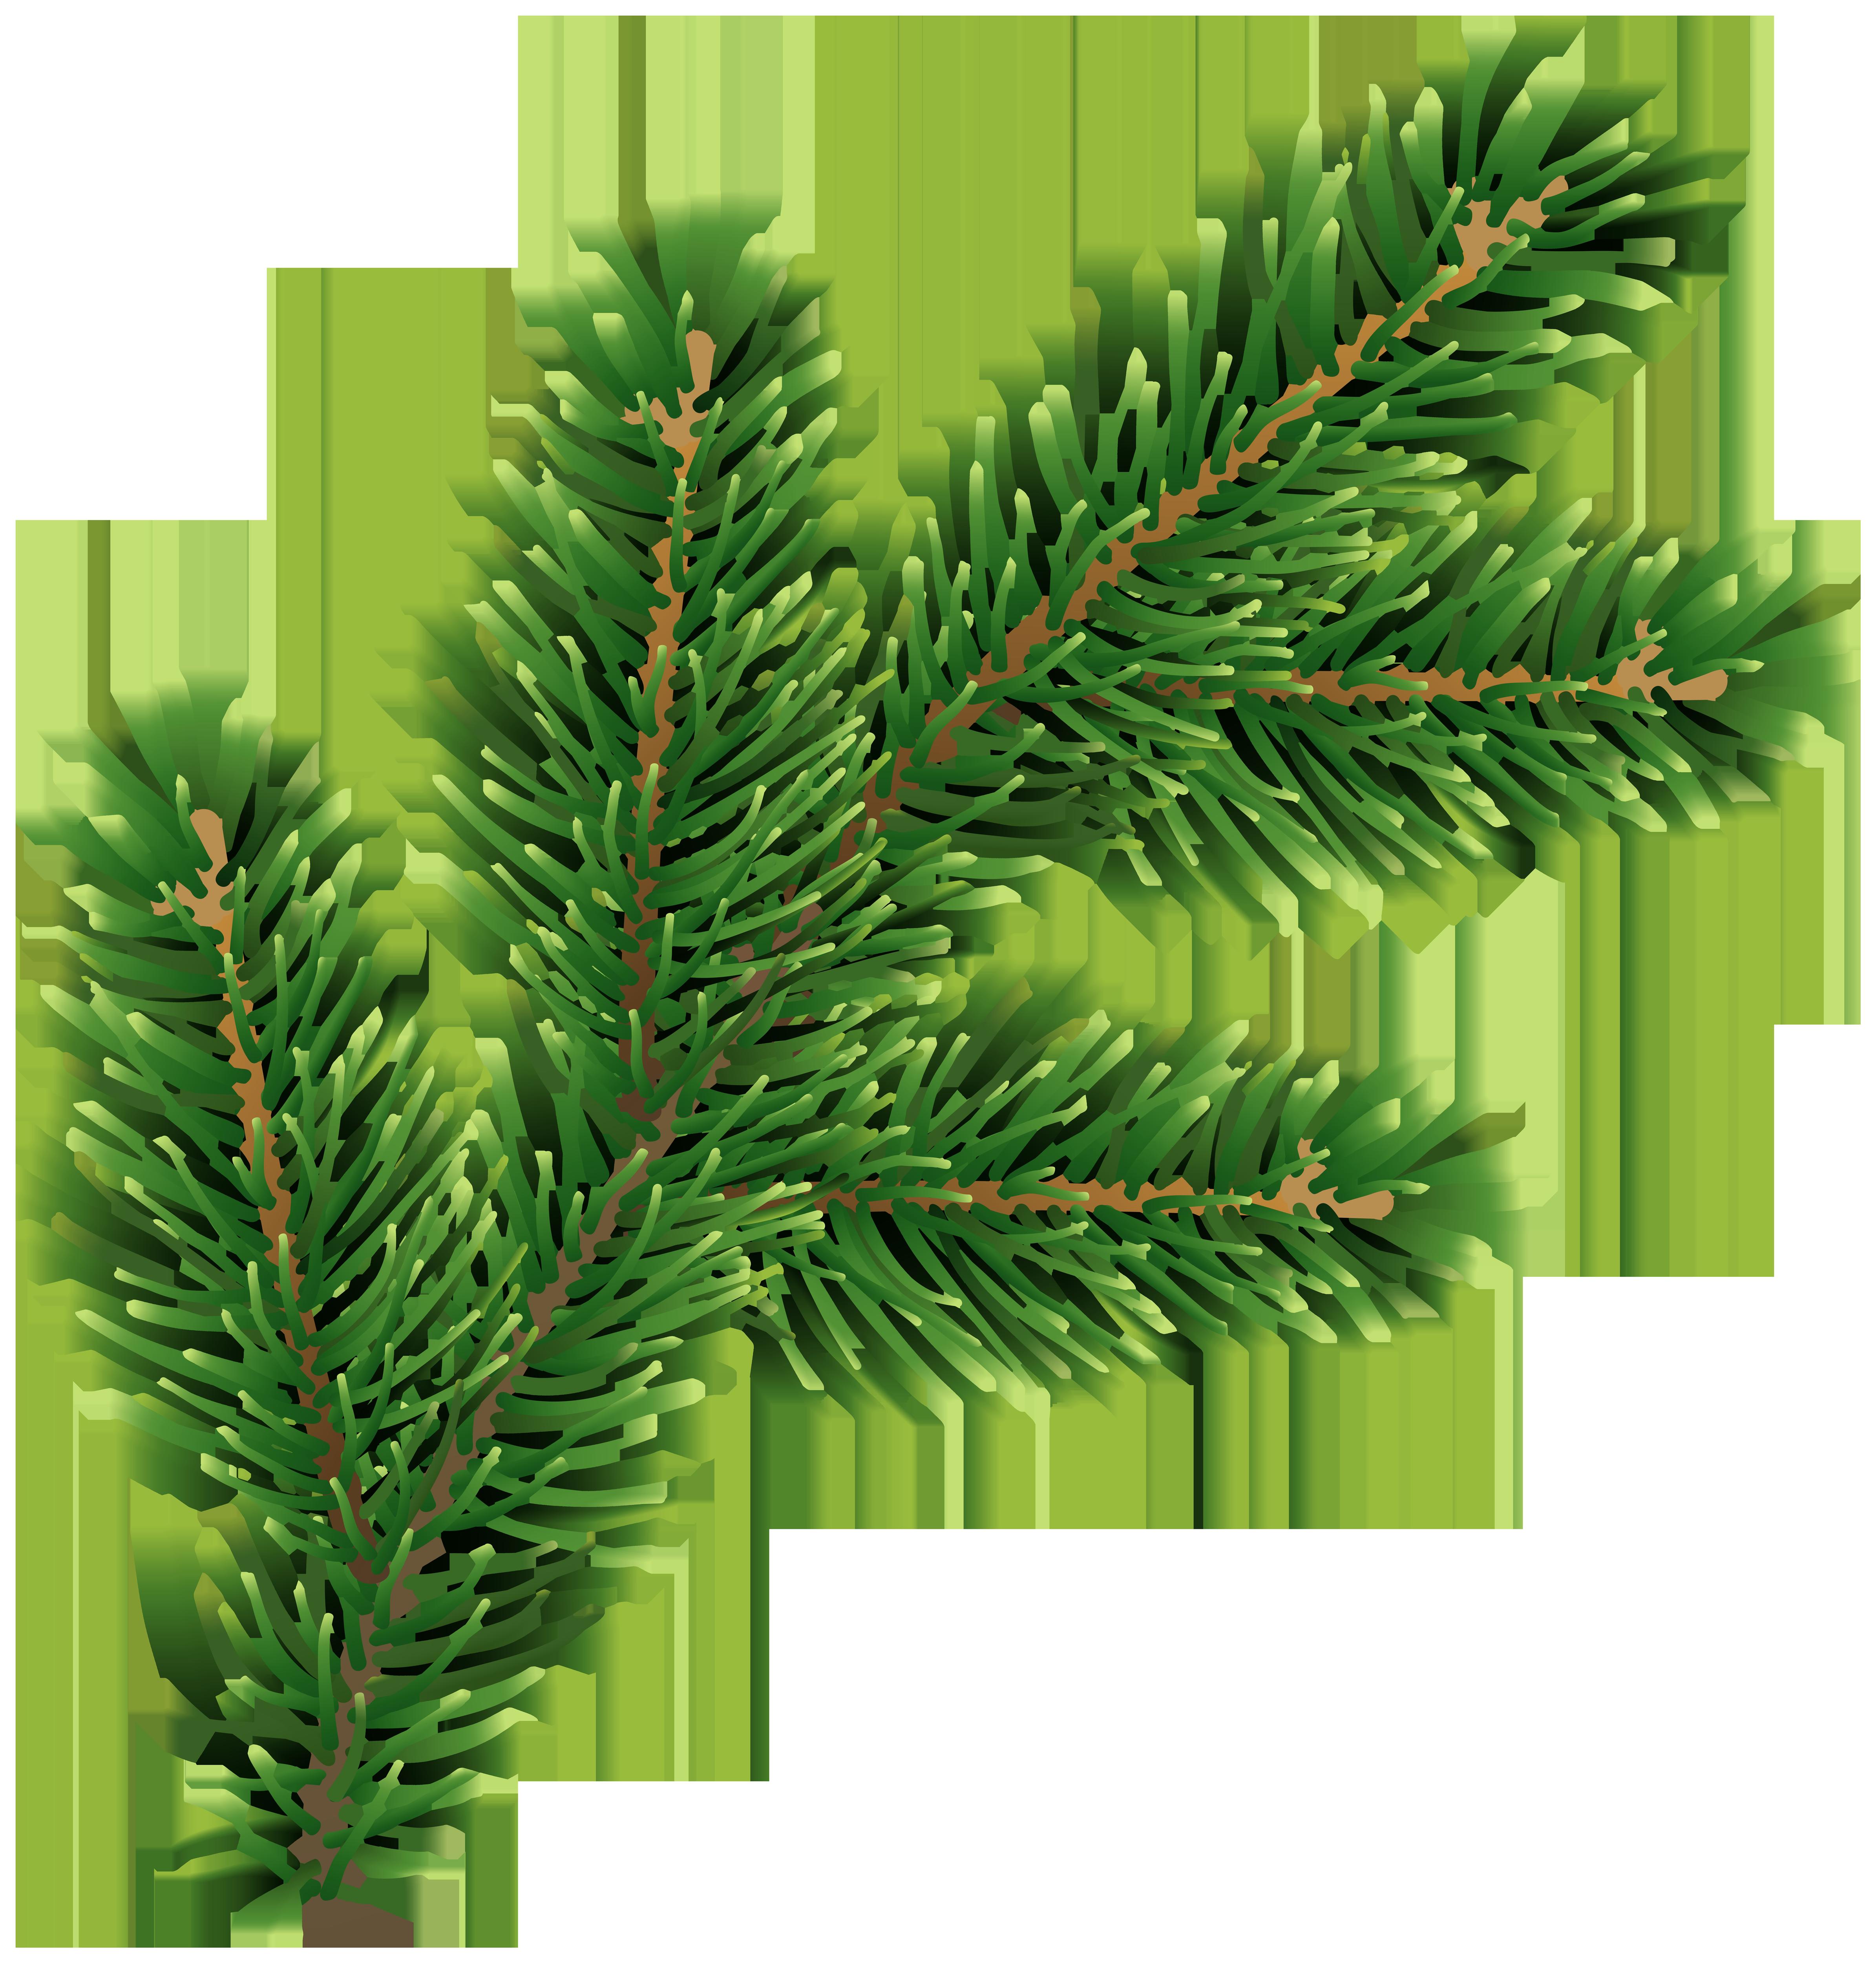 Pine Branch Clip Art Deco Image.